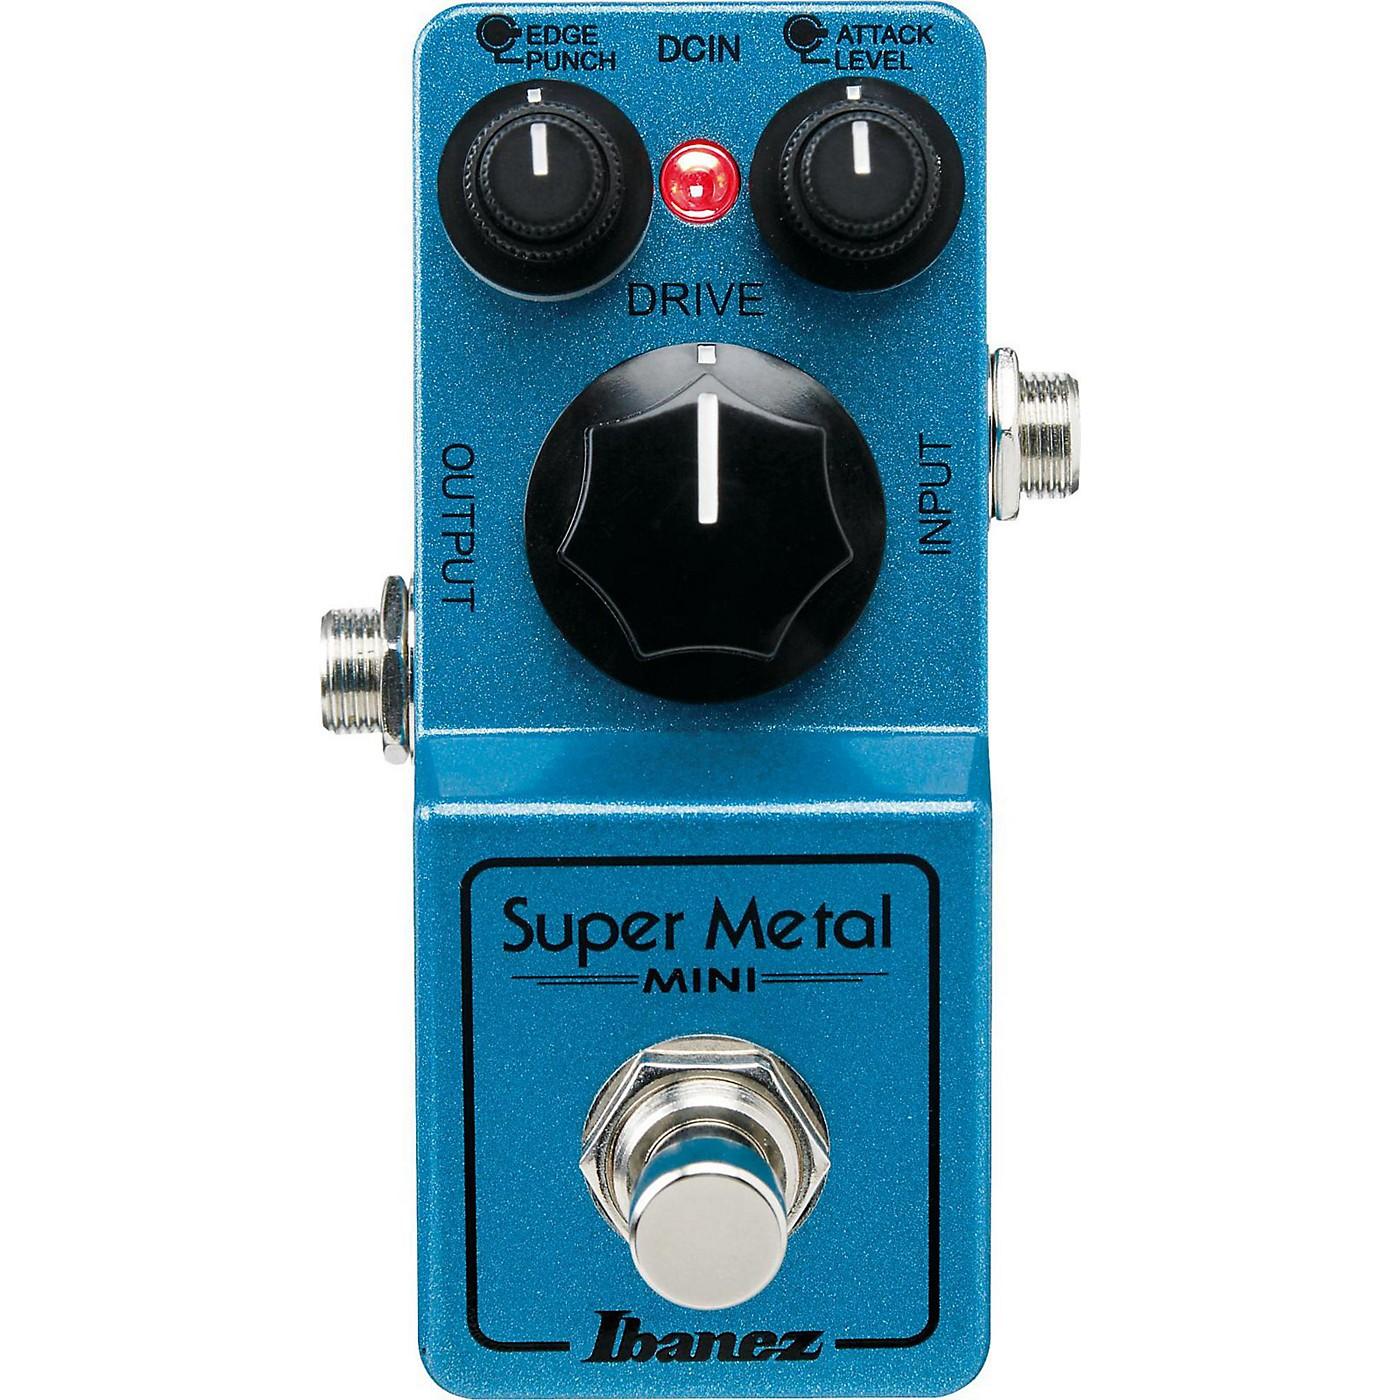 Ibanez Mini Super Metal Guitar Pedal thumbnail